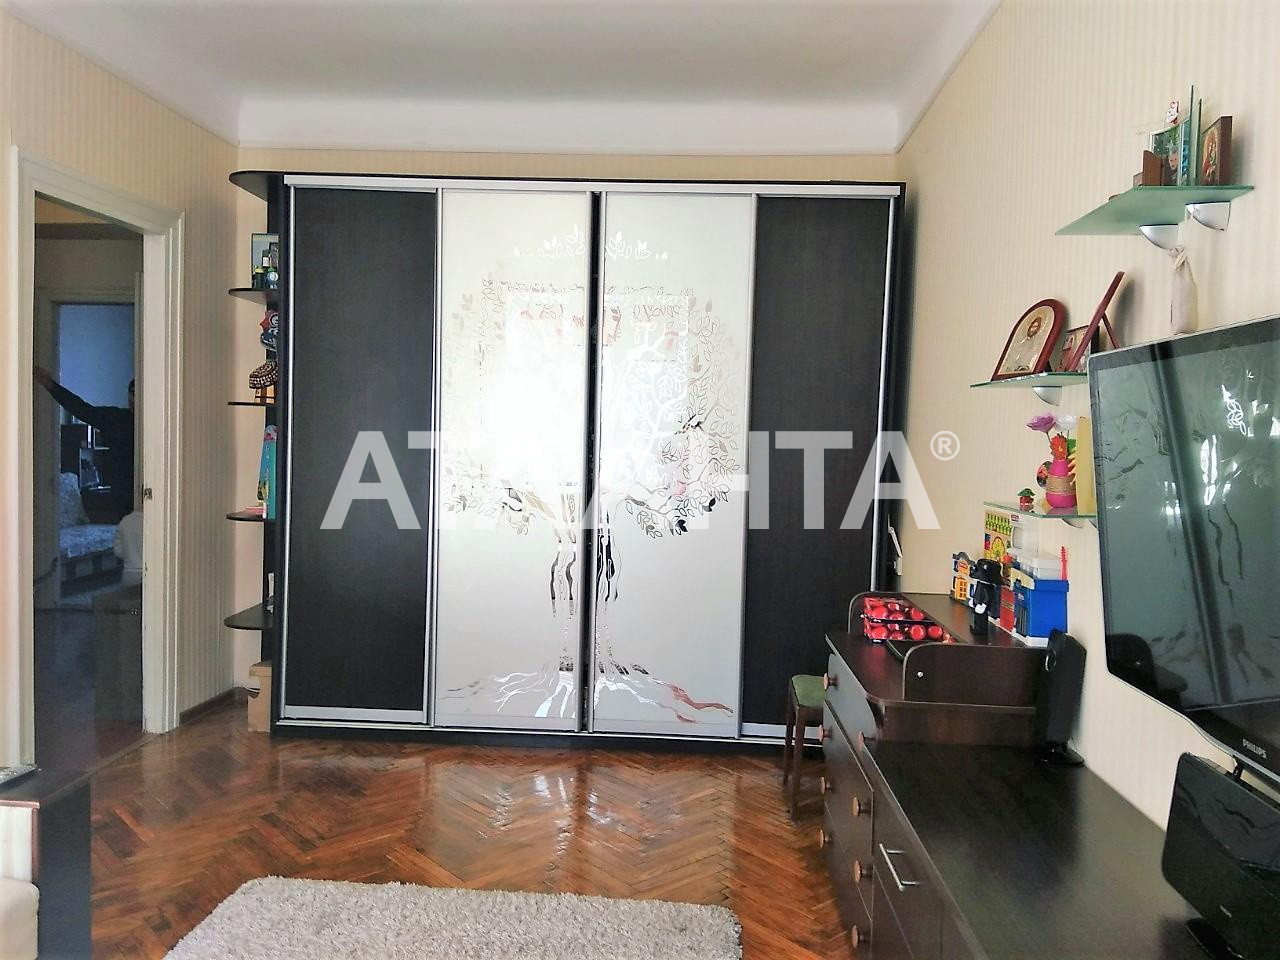 Продается 3-комнатная Квартира на ул. Ул. Семьи Хохловых — 72 000 у.е. (фото №2)